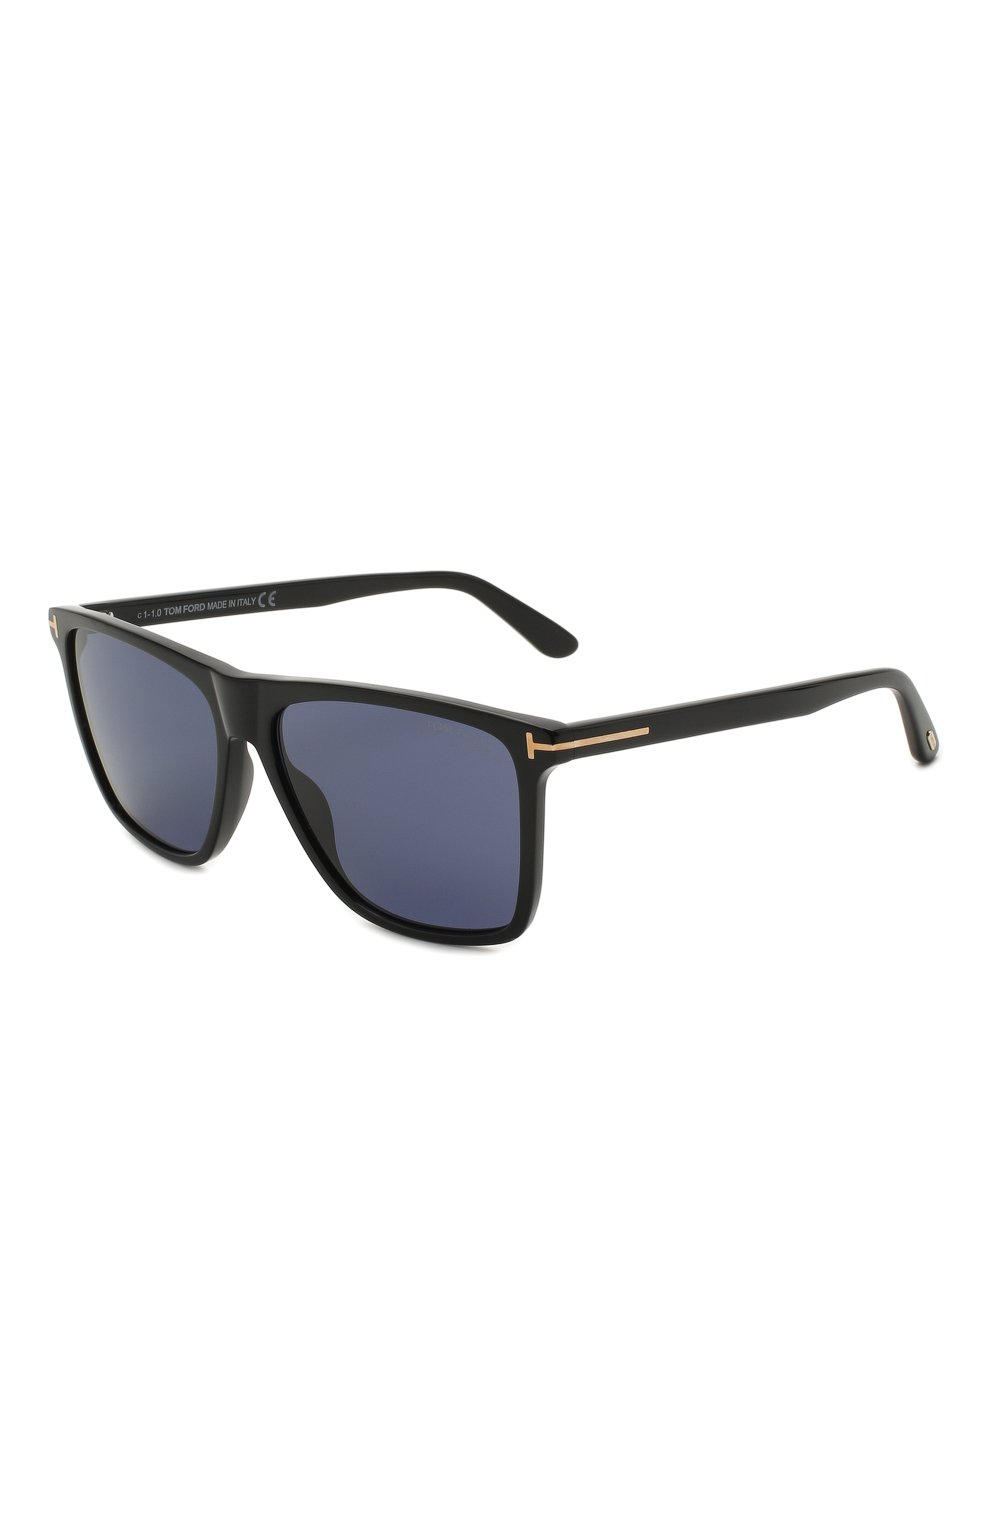 Мужские солнцезащитные очки TOM FORD черного цвета, арт. TF832 01V | Фото 1